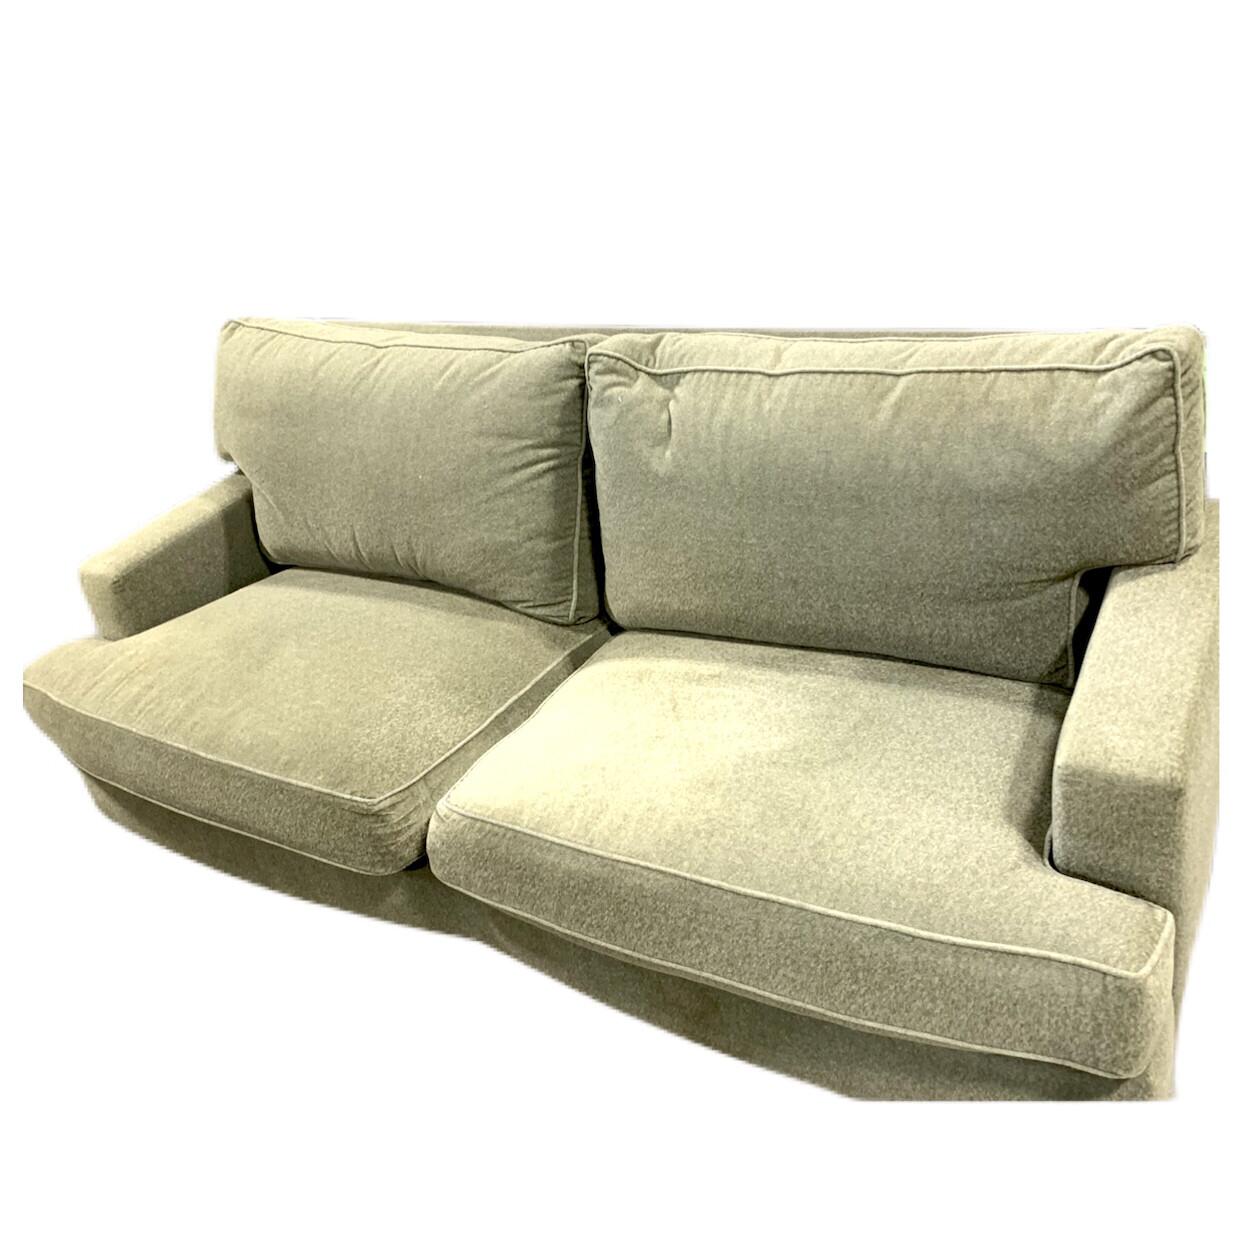 Olive Fleece Sofa